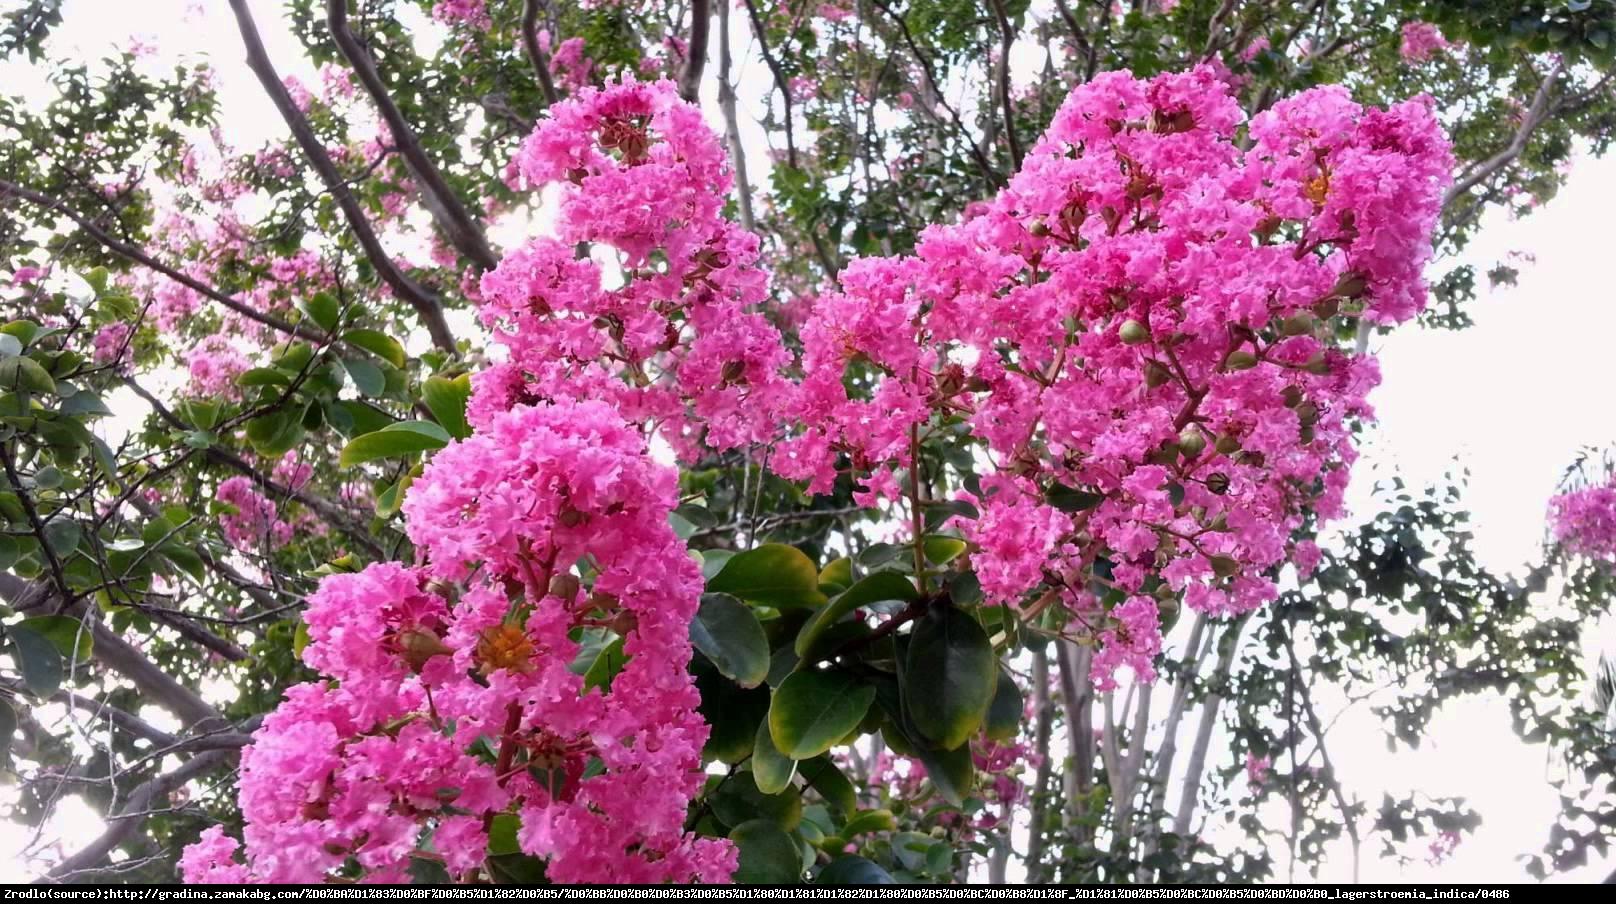 Lagerstremia indyjska 'Purpurea' - Bez Południa - Lagerstroemia indica 'Purpurea'